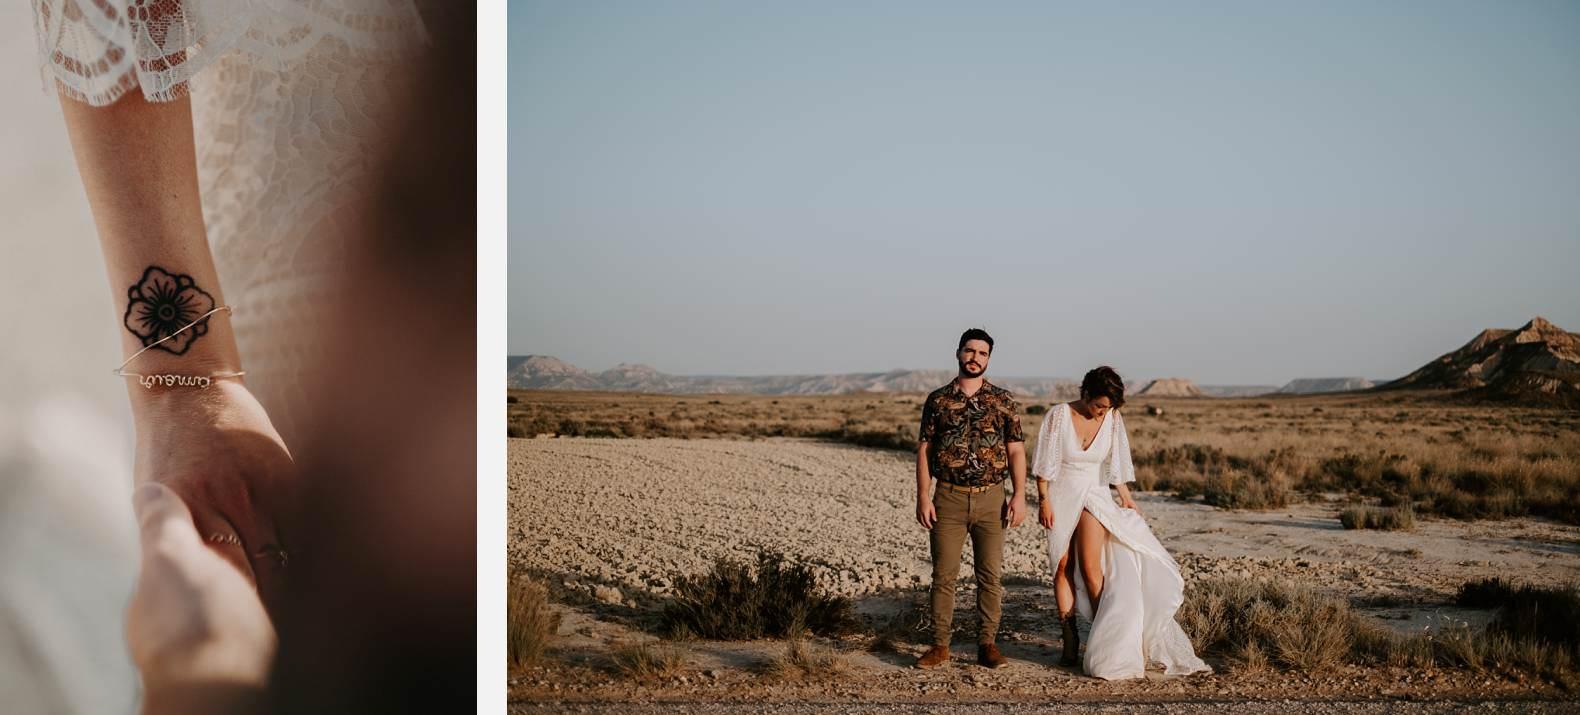 mariage espagne bardenas festival you and me elopement photographe bel esprit desert 0034